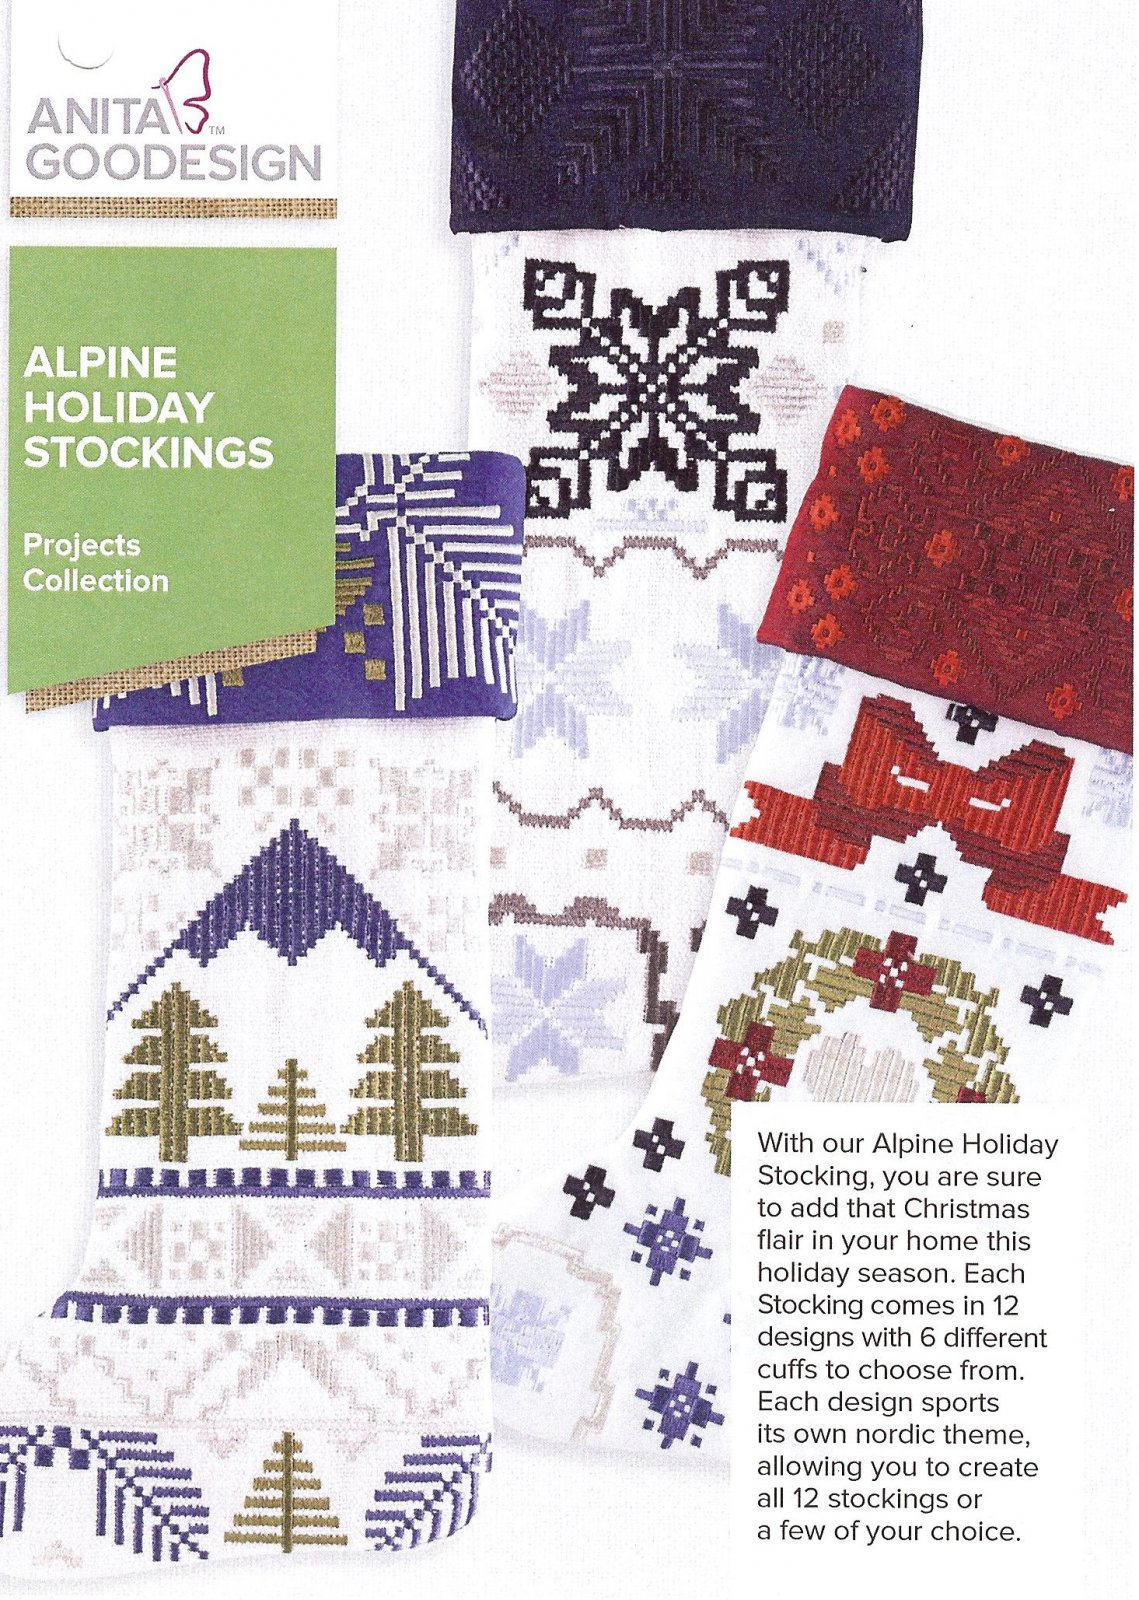 Anita Goodesign Projects Alpine Holiday Stockings